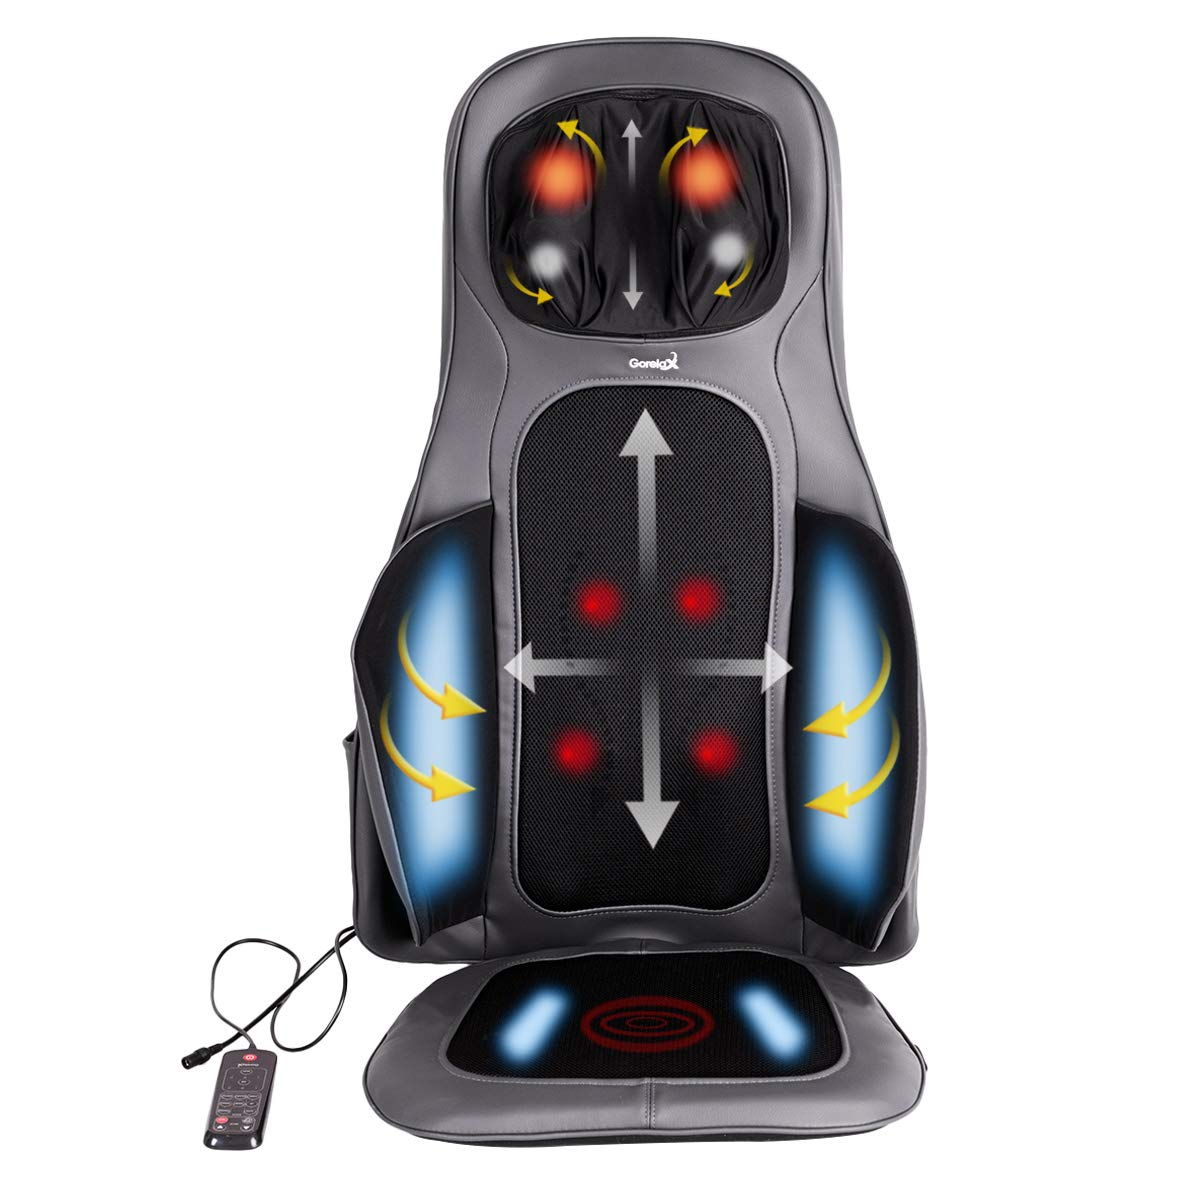 Giantex Back And Neck Massager Shiatsu Massage Seat Cushion With Heat Full Back Deep Kneading Massage Mat Upper Low Back Heated Massager With Vibration Home Office Chair Massage Pad Dark Gray